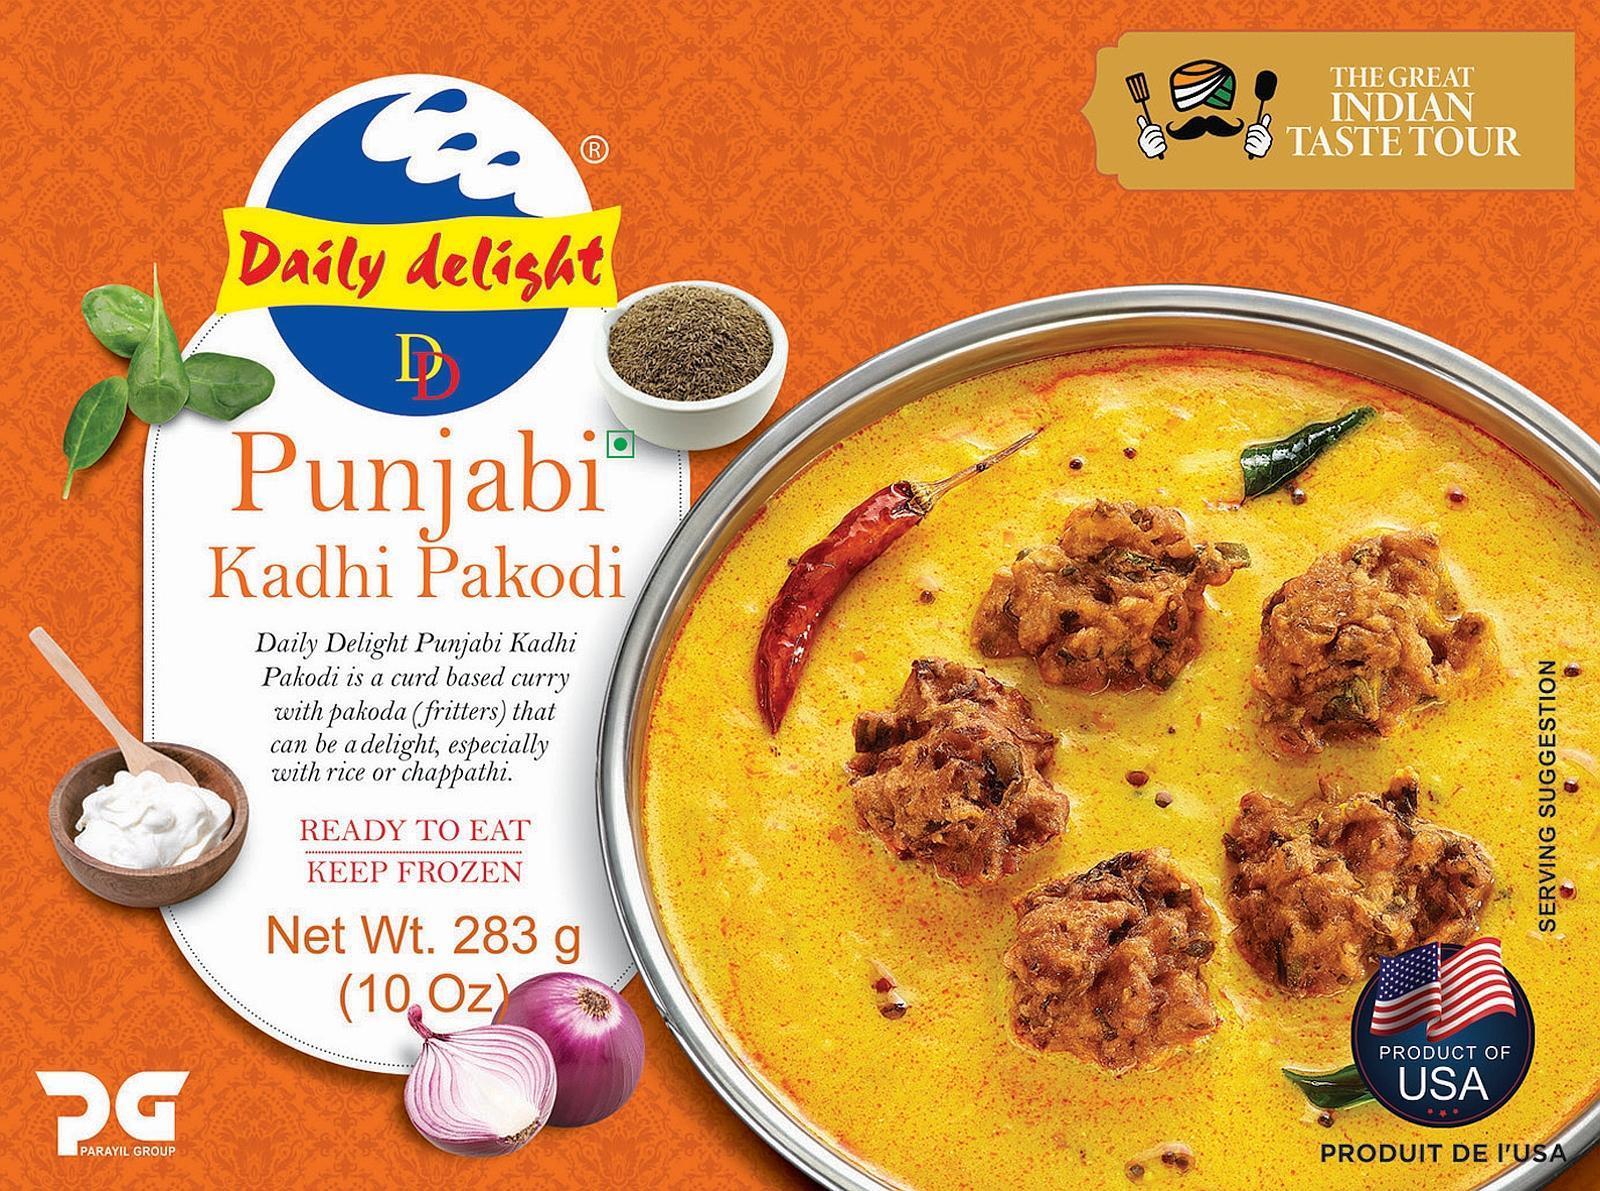 Daily Delight Punjabi Kadhi Pakodi